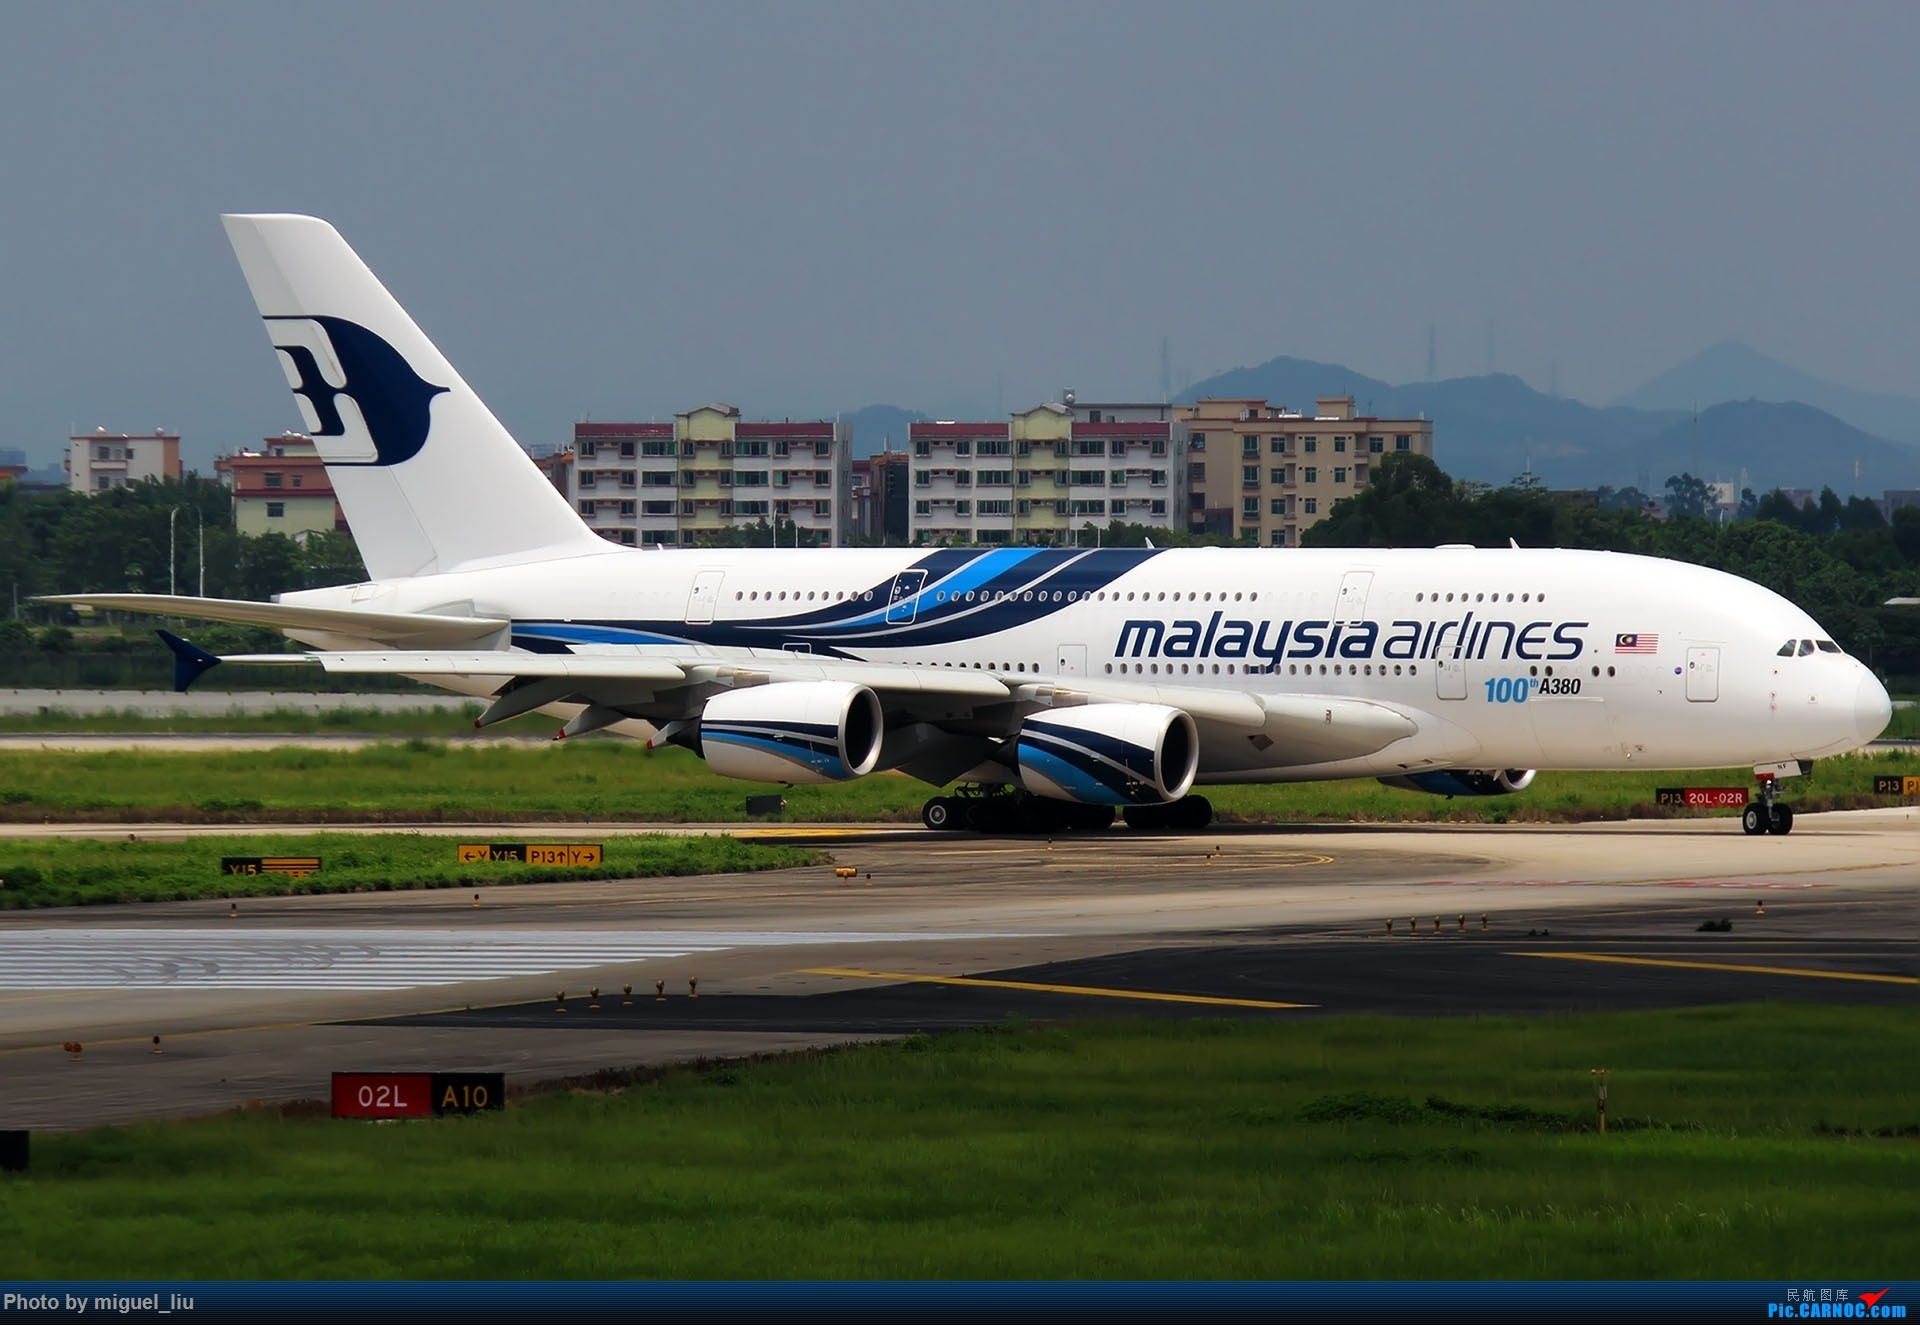 Re:[原创][*********Miguel_liu********]7月28日例行打卡 AIRBUS A380-800 9M-MNF 中国广州白云国际机场